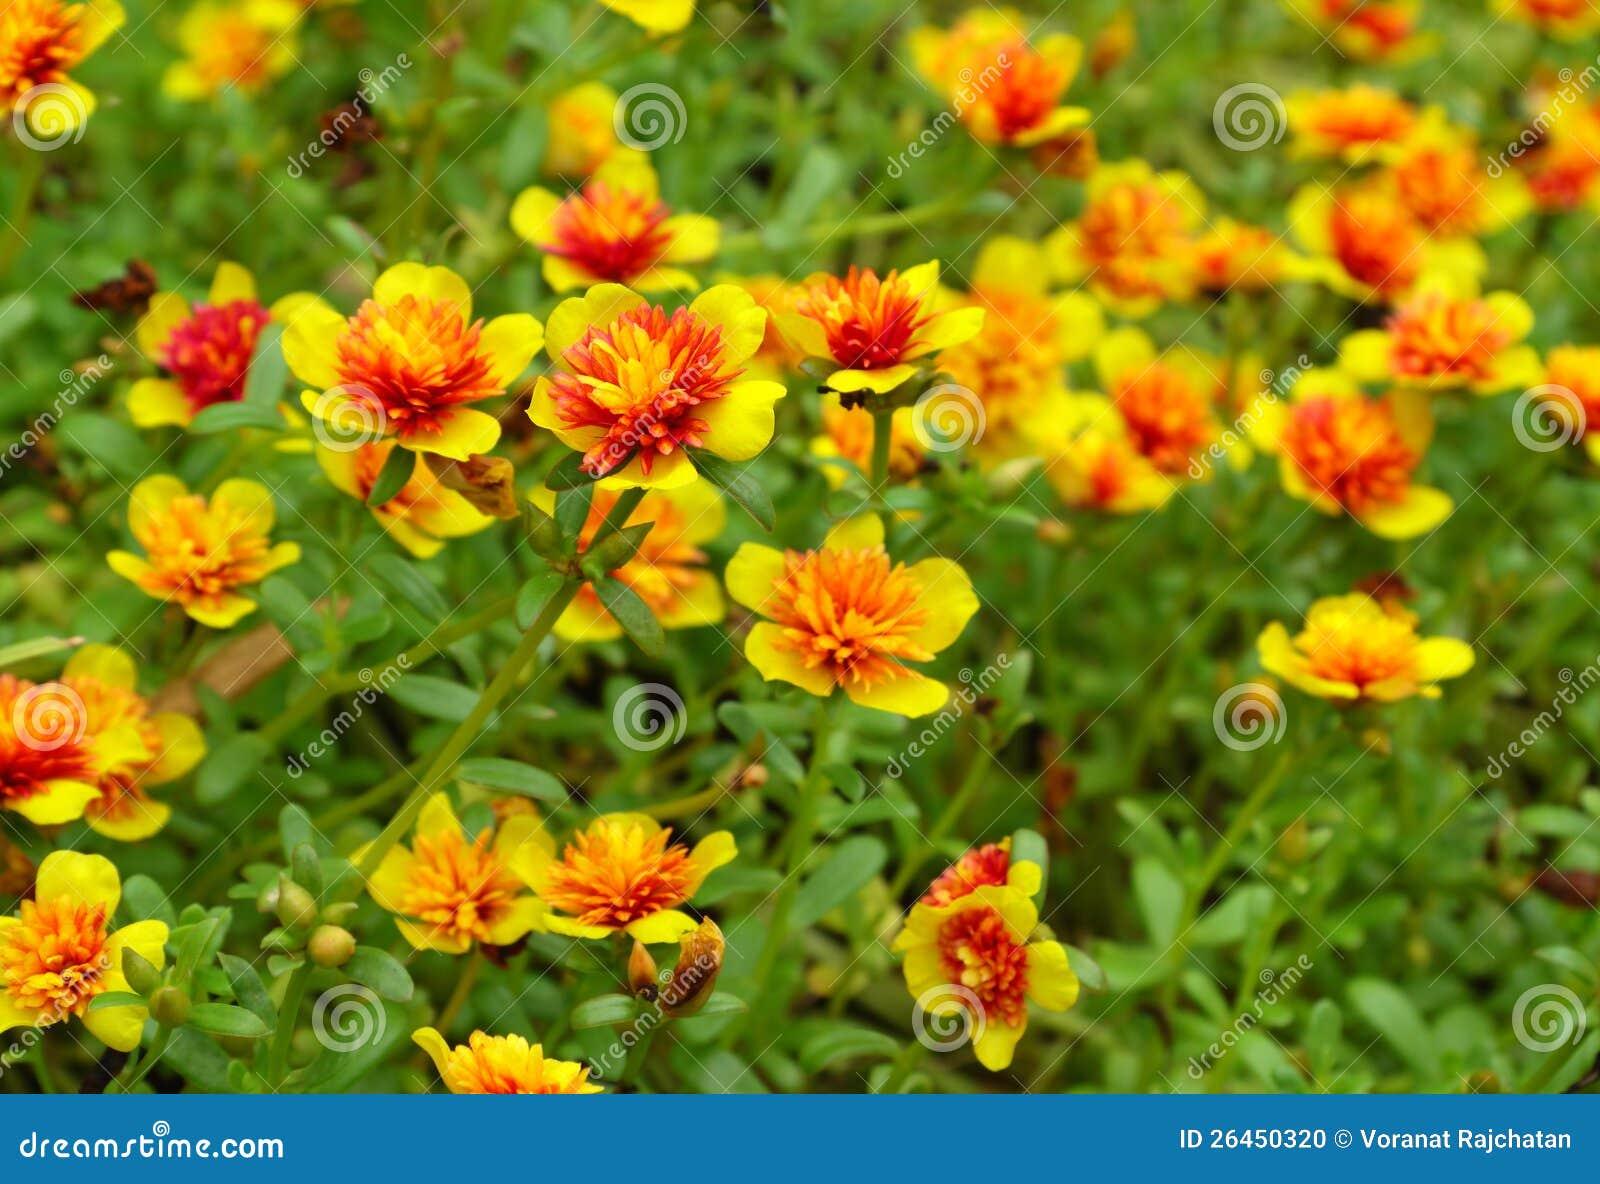 Little Common Purslane Flowers Stock Photo - Image: 26450320